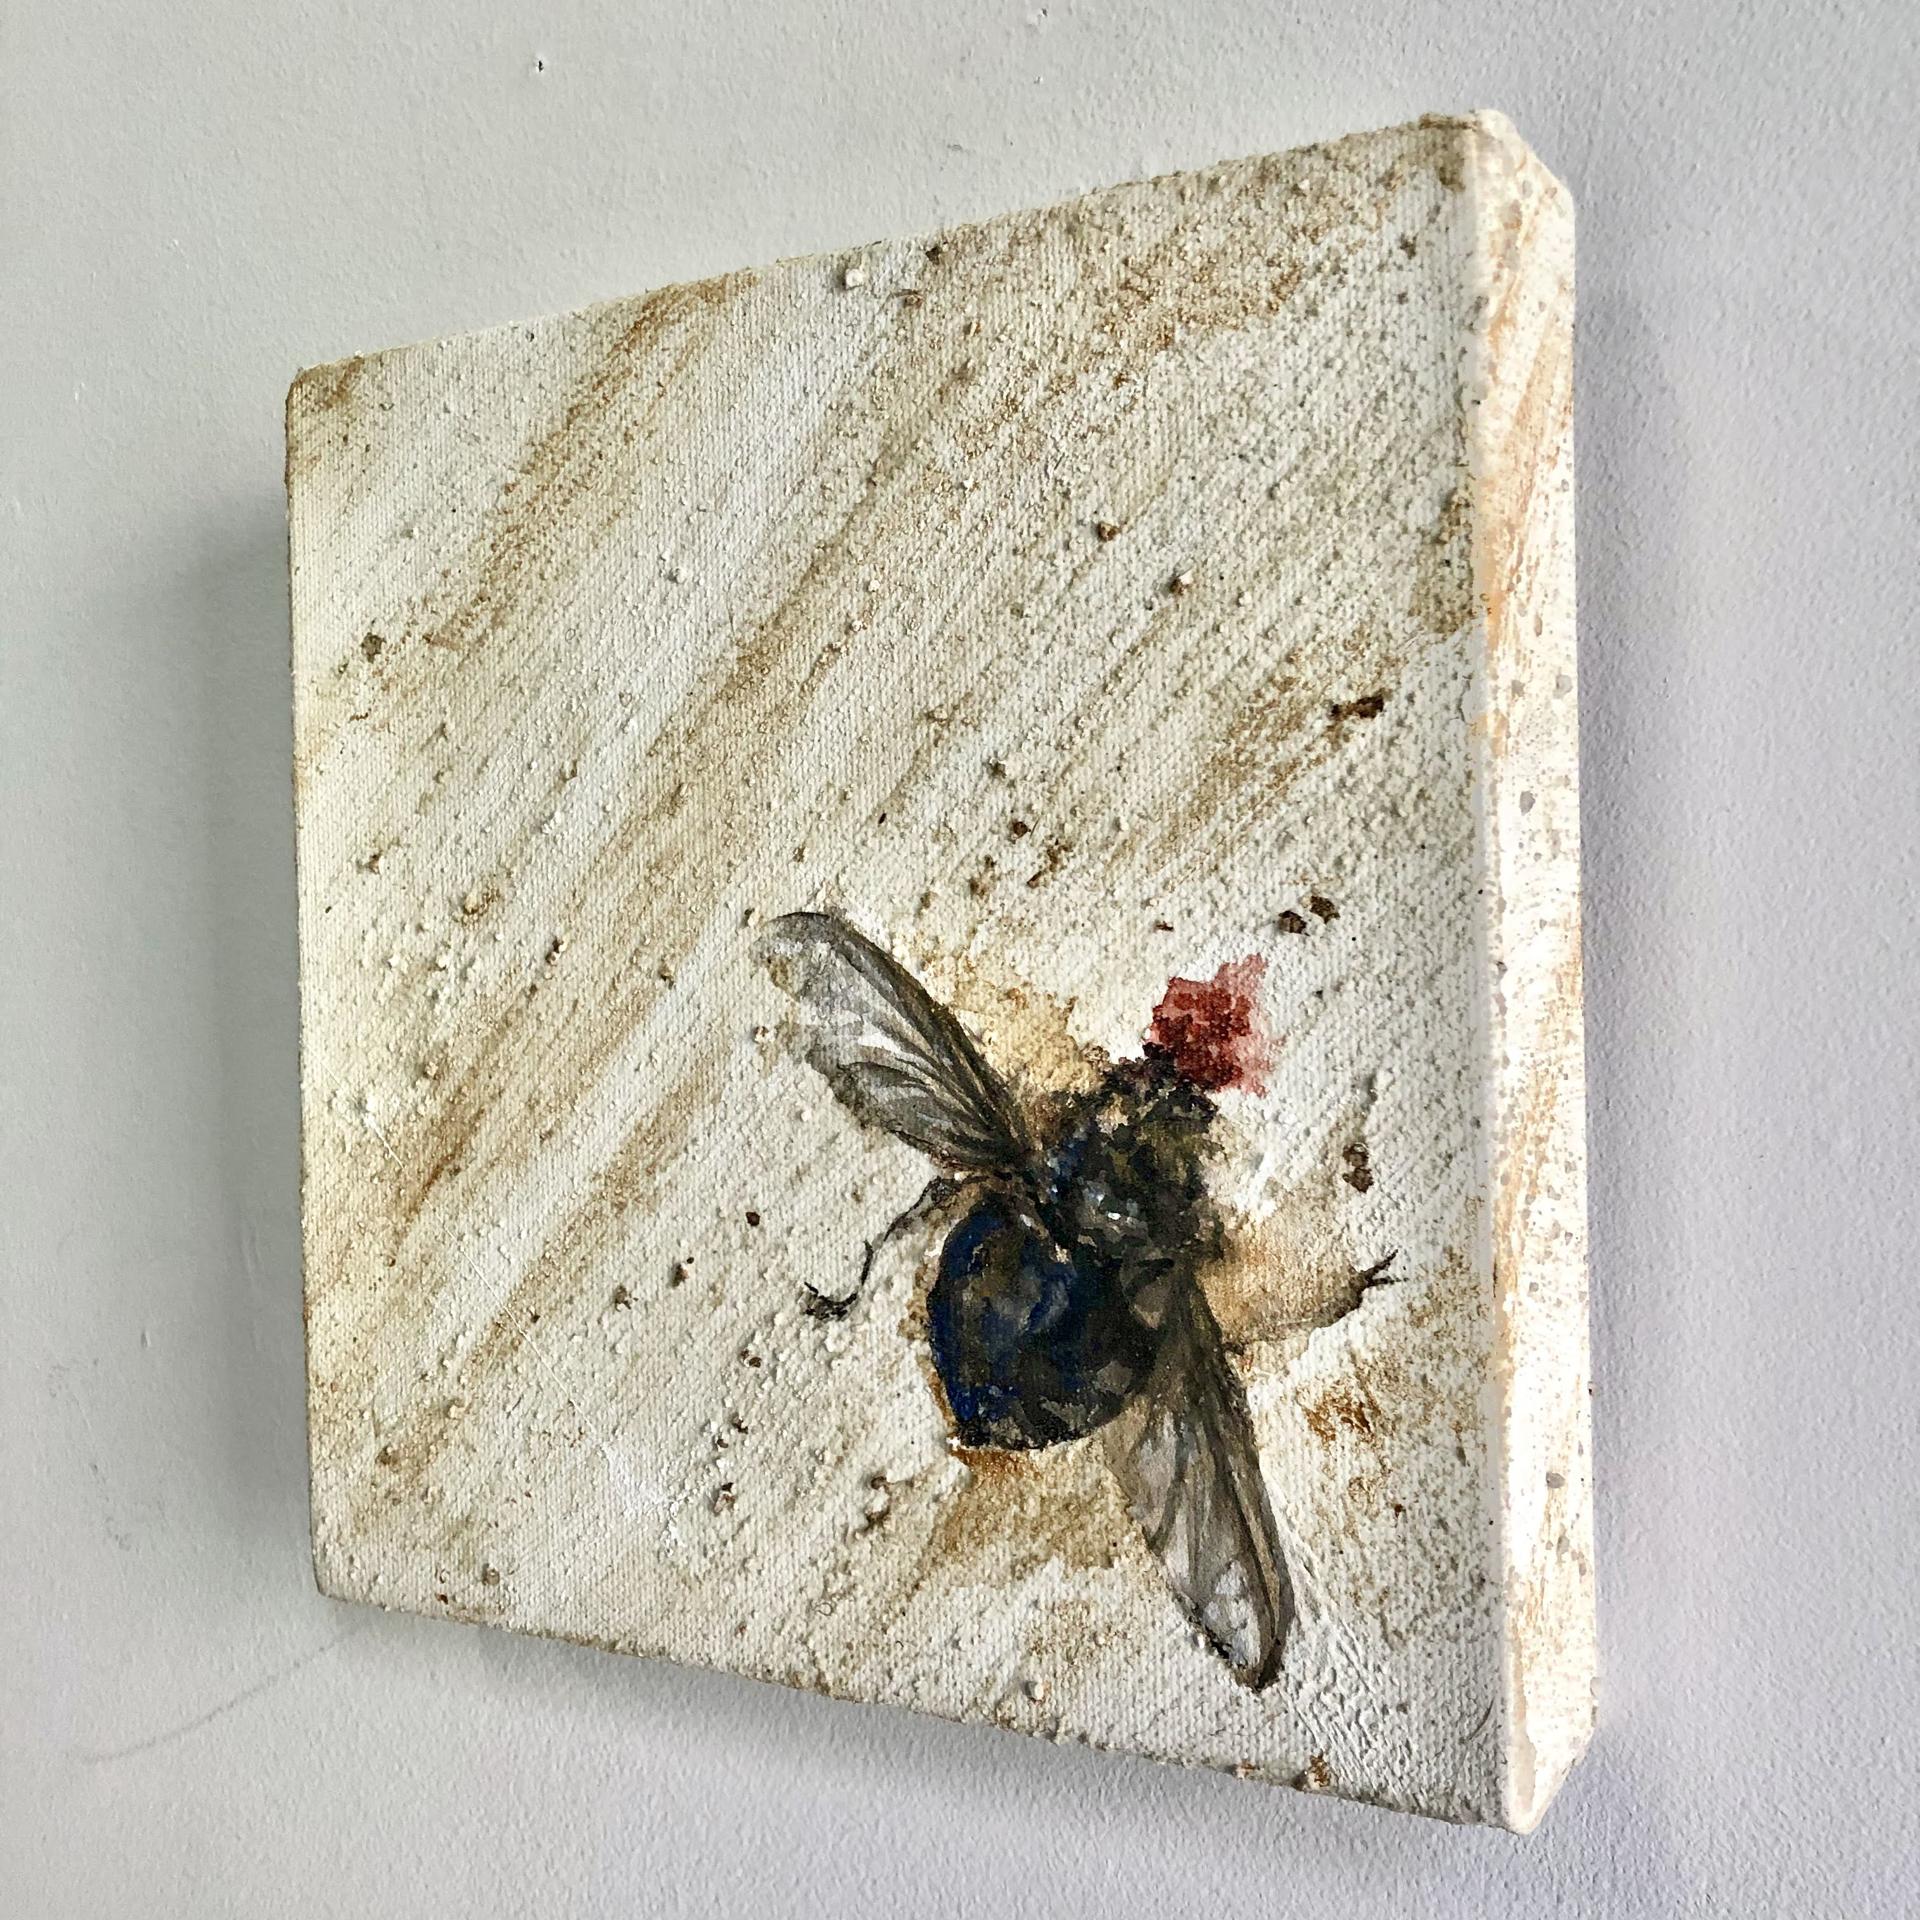 Splat by Cindy Shih